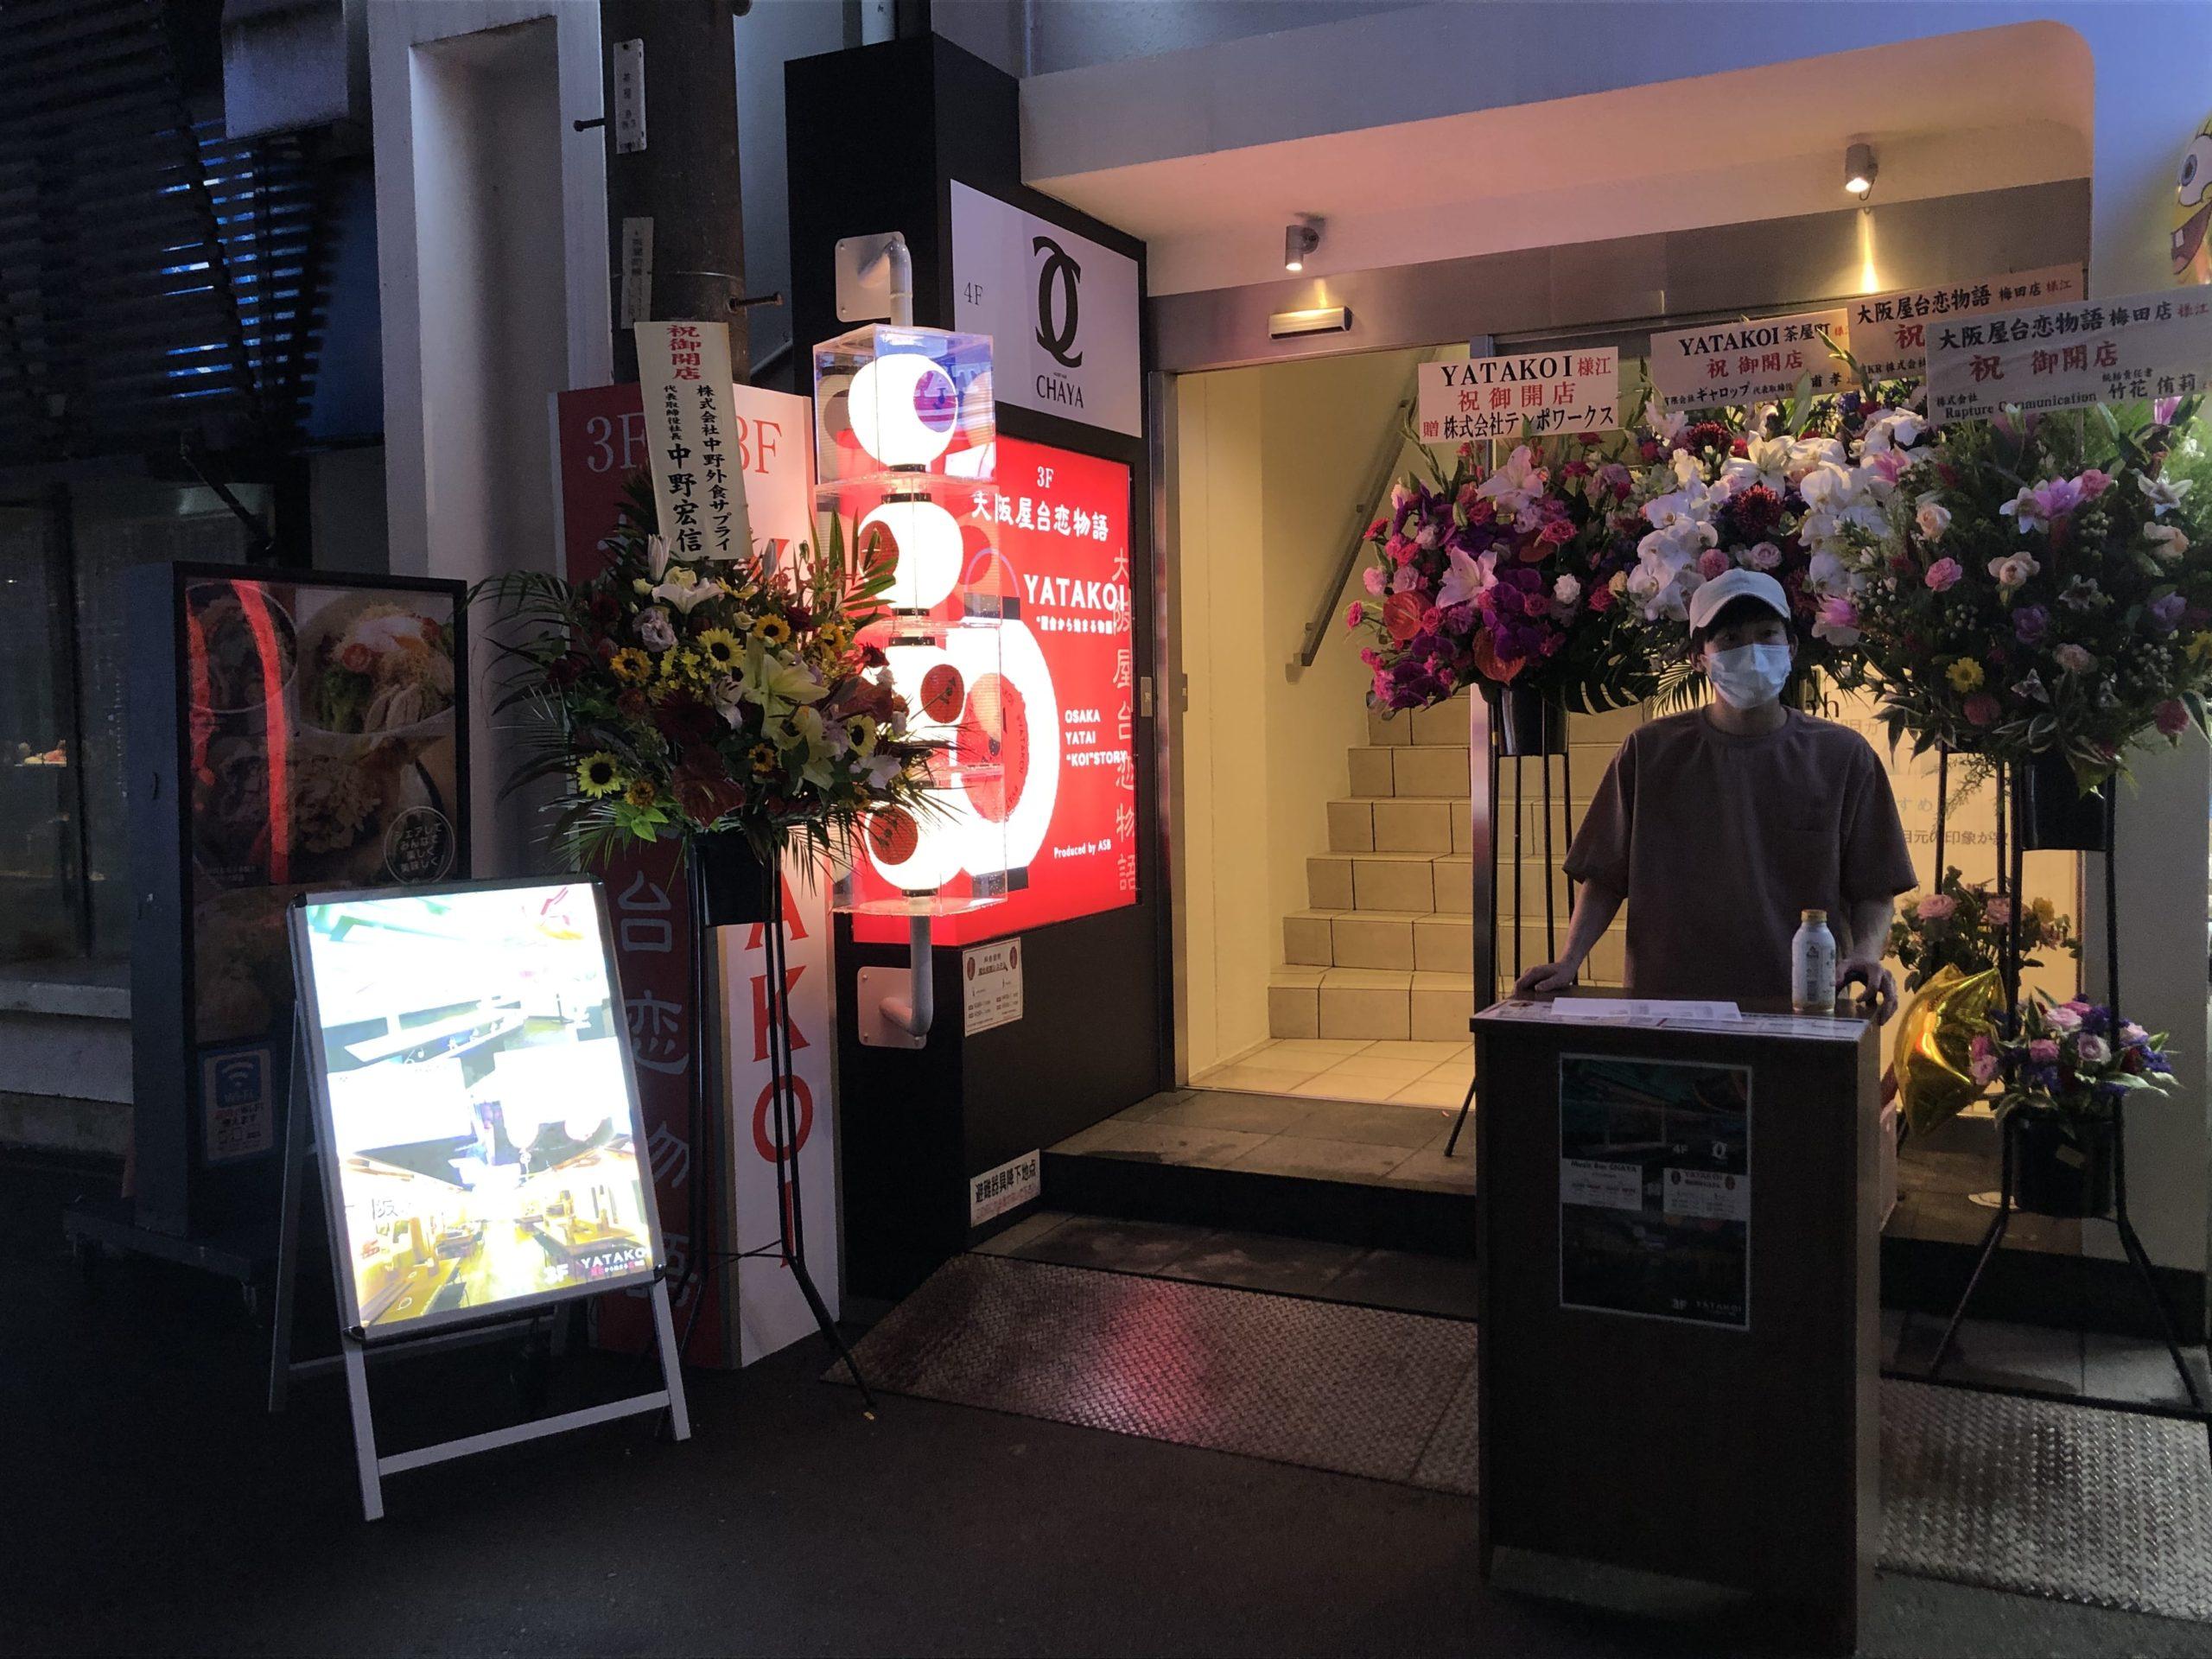 YATAKOI entrance